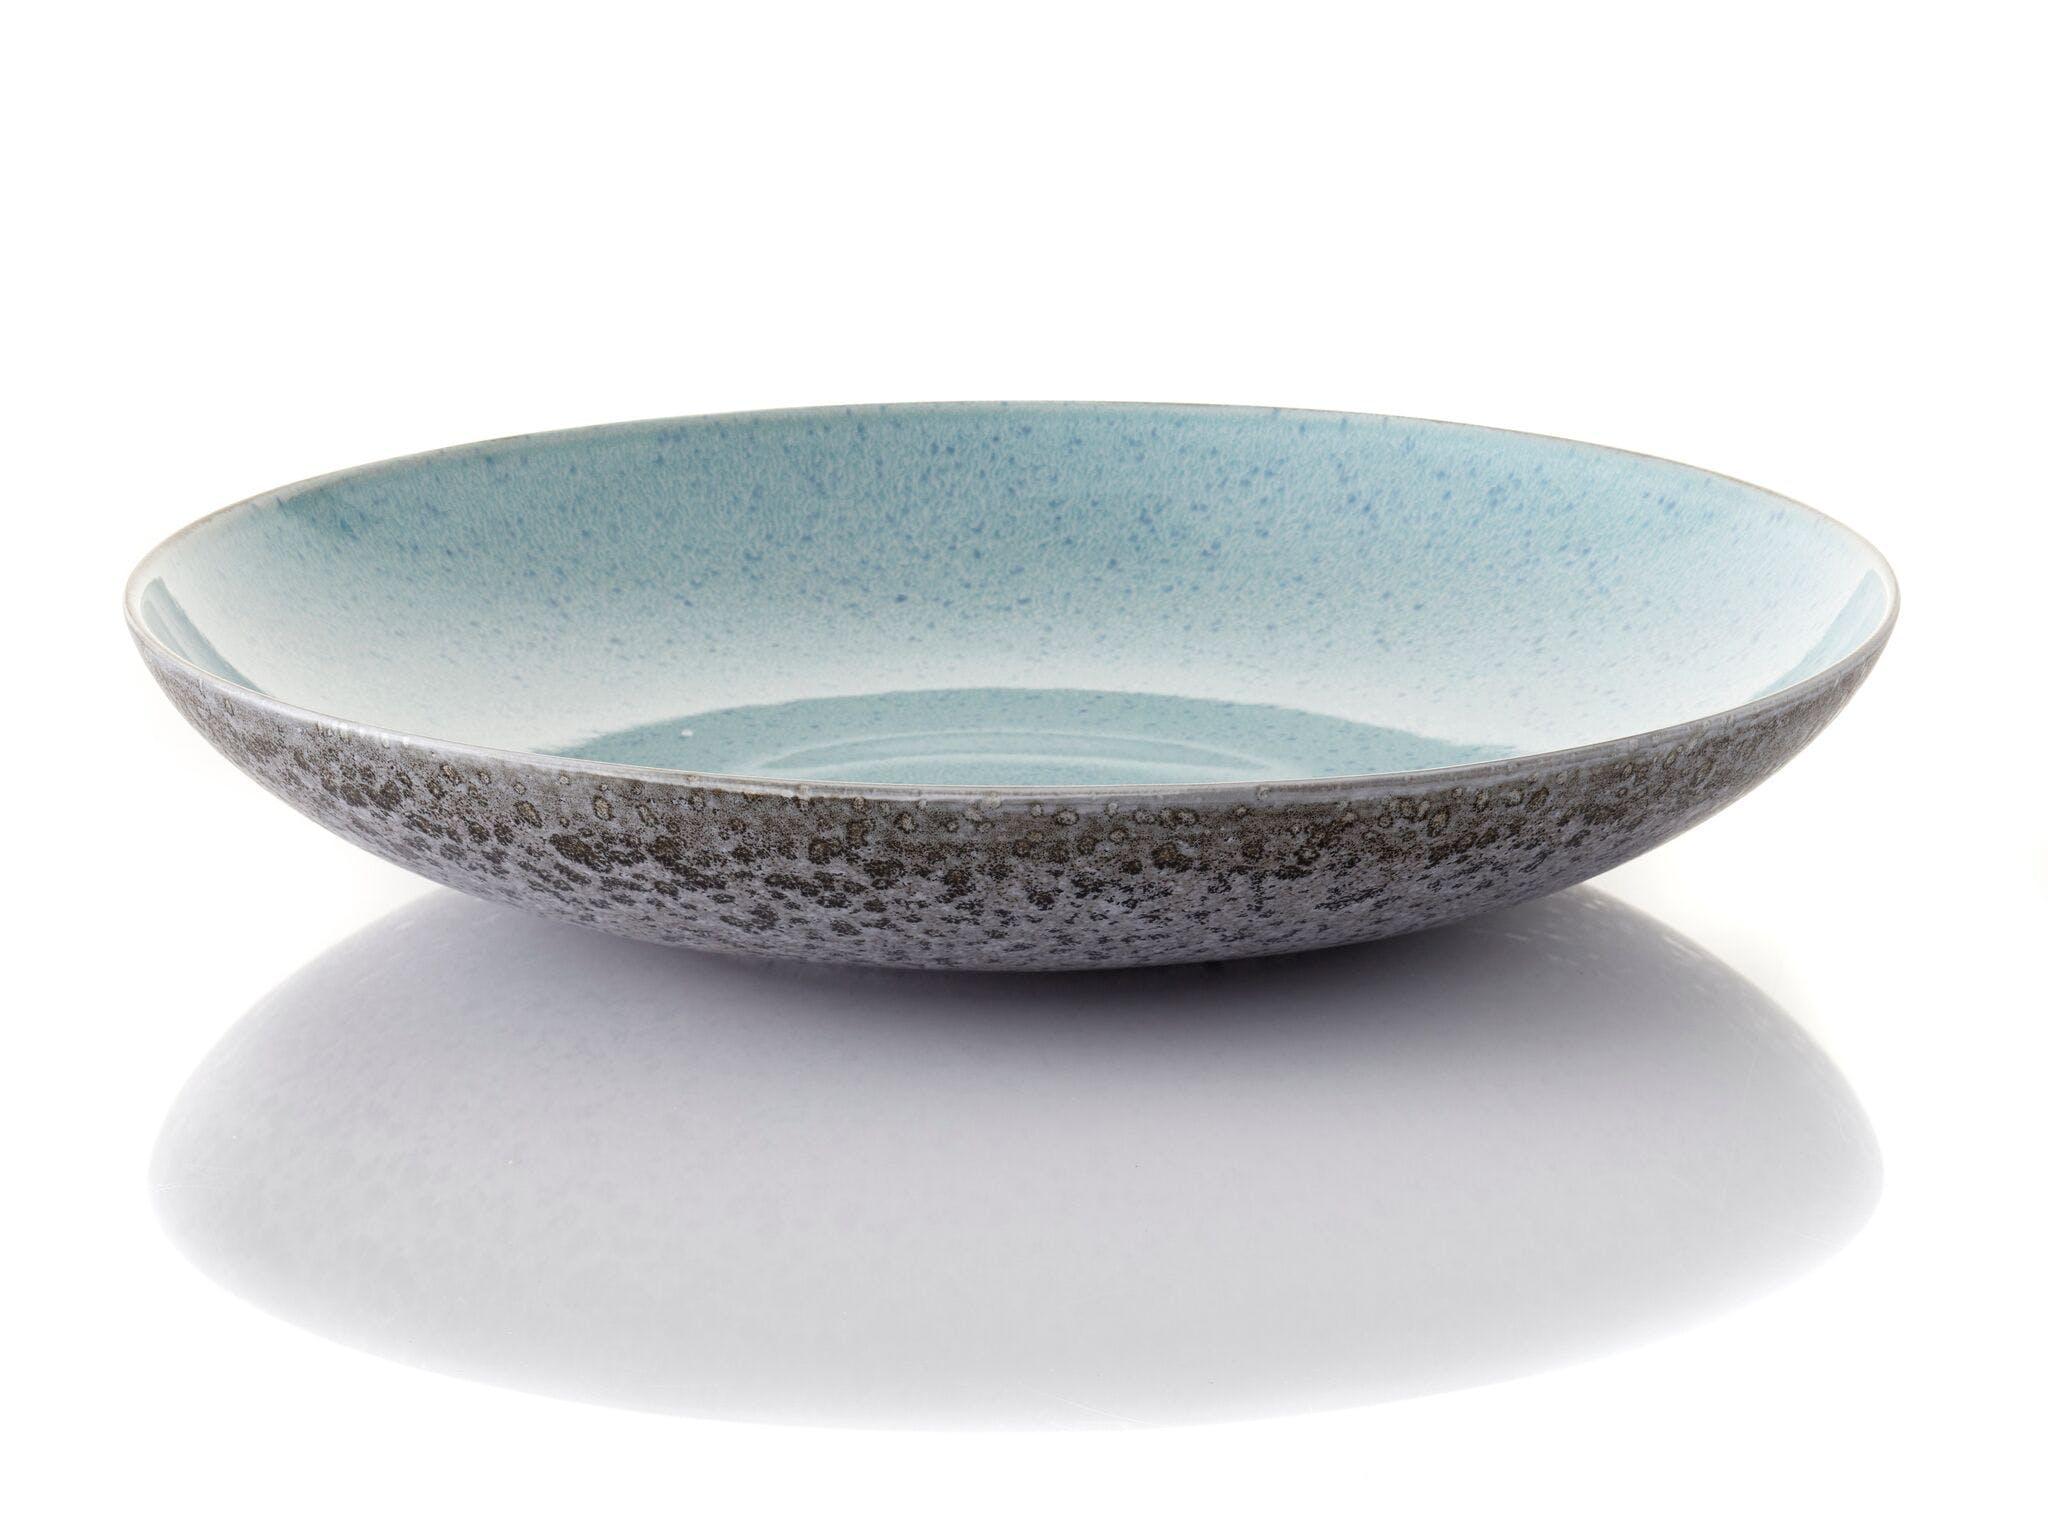 keramik christian bitz fad bordfad lyseblå